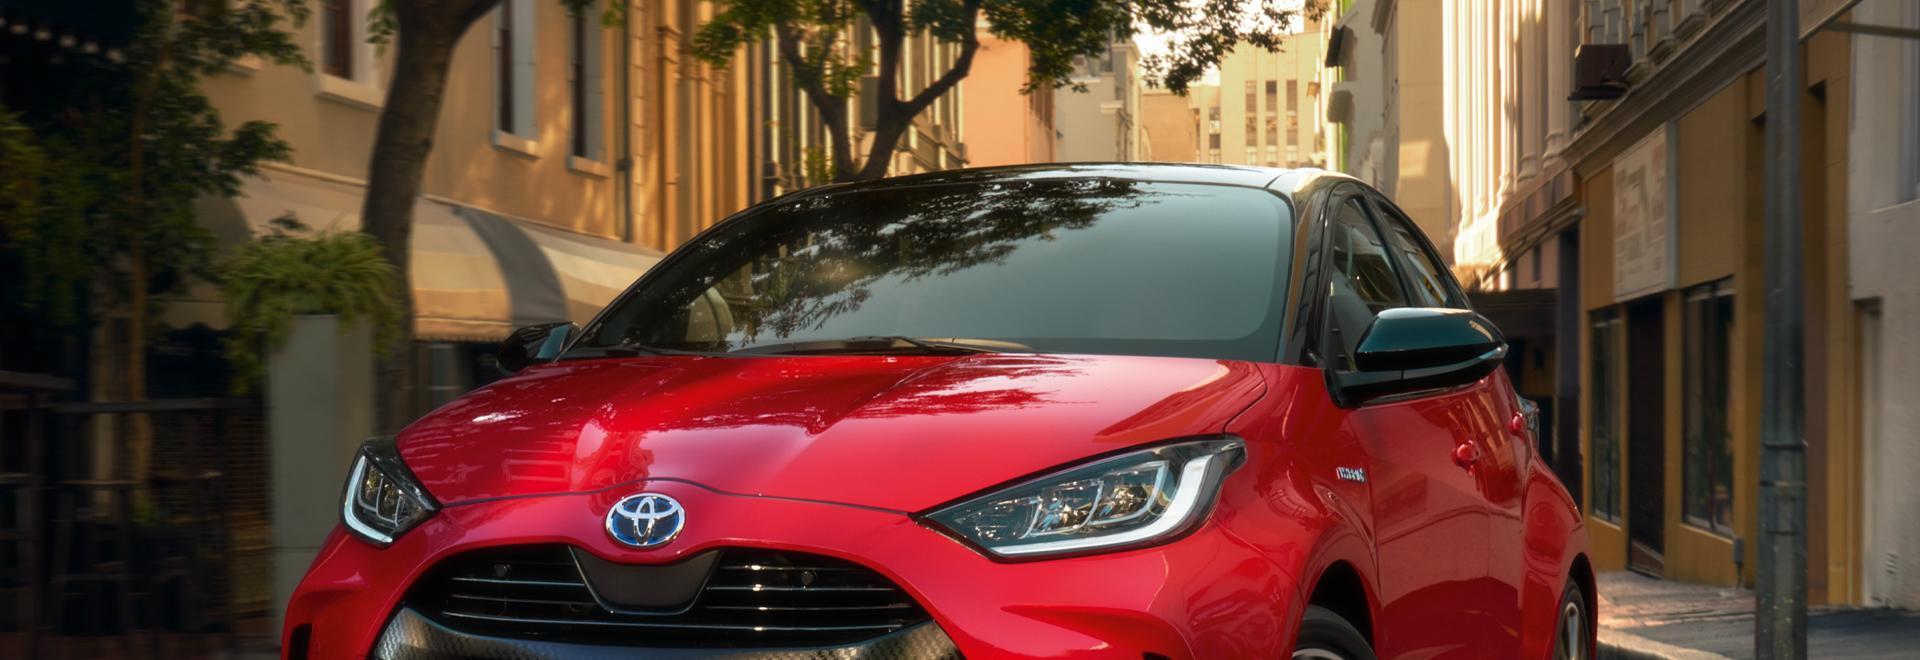 Toyota Yaris Hybrid - Esterni e dinamica